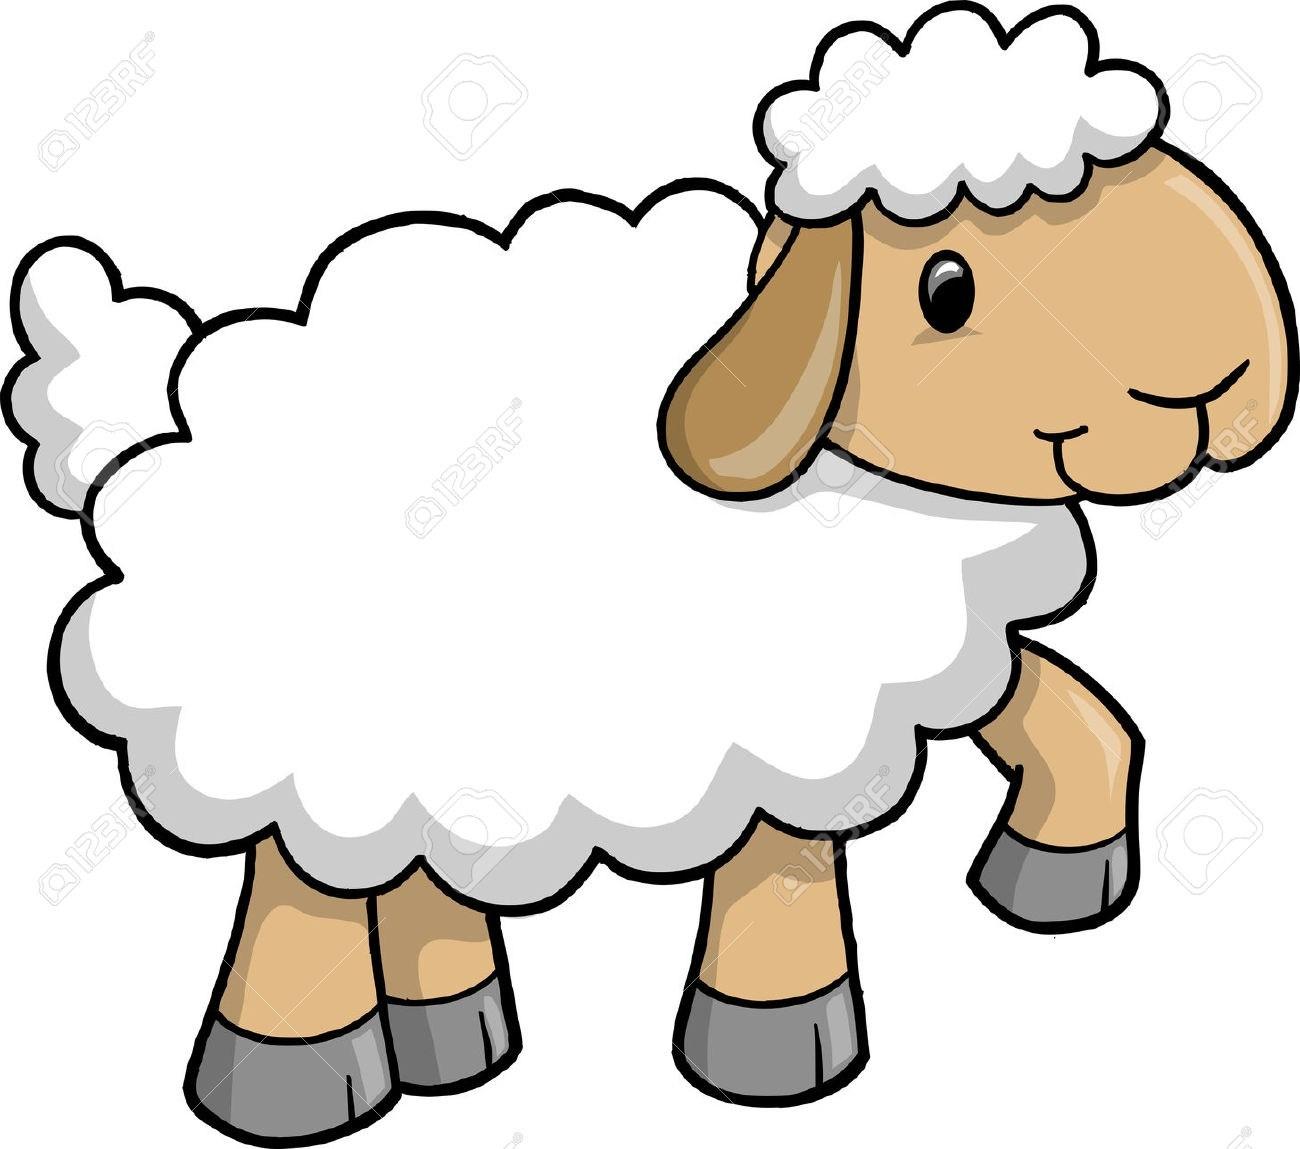 Jokingart com. Clipart sheep